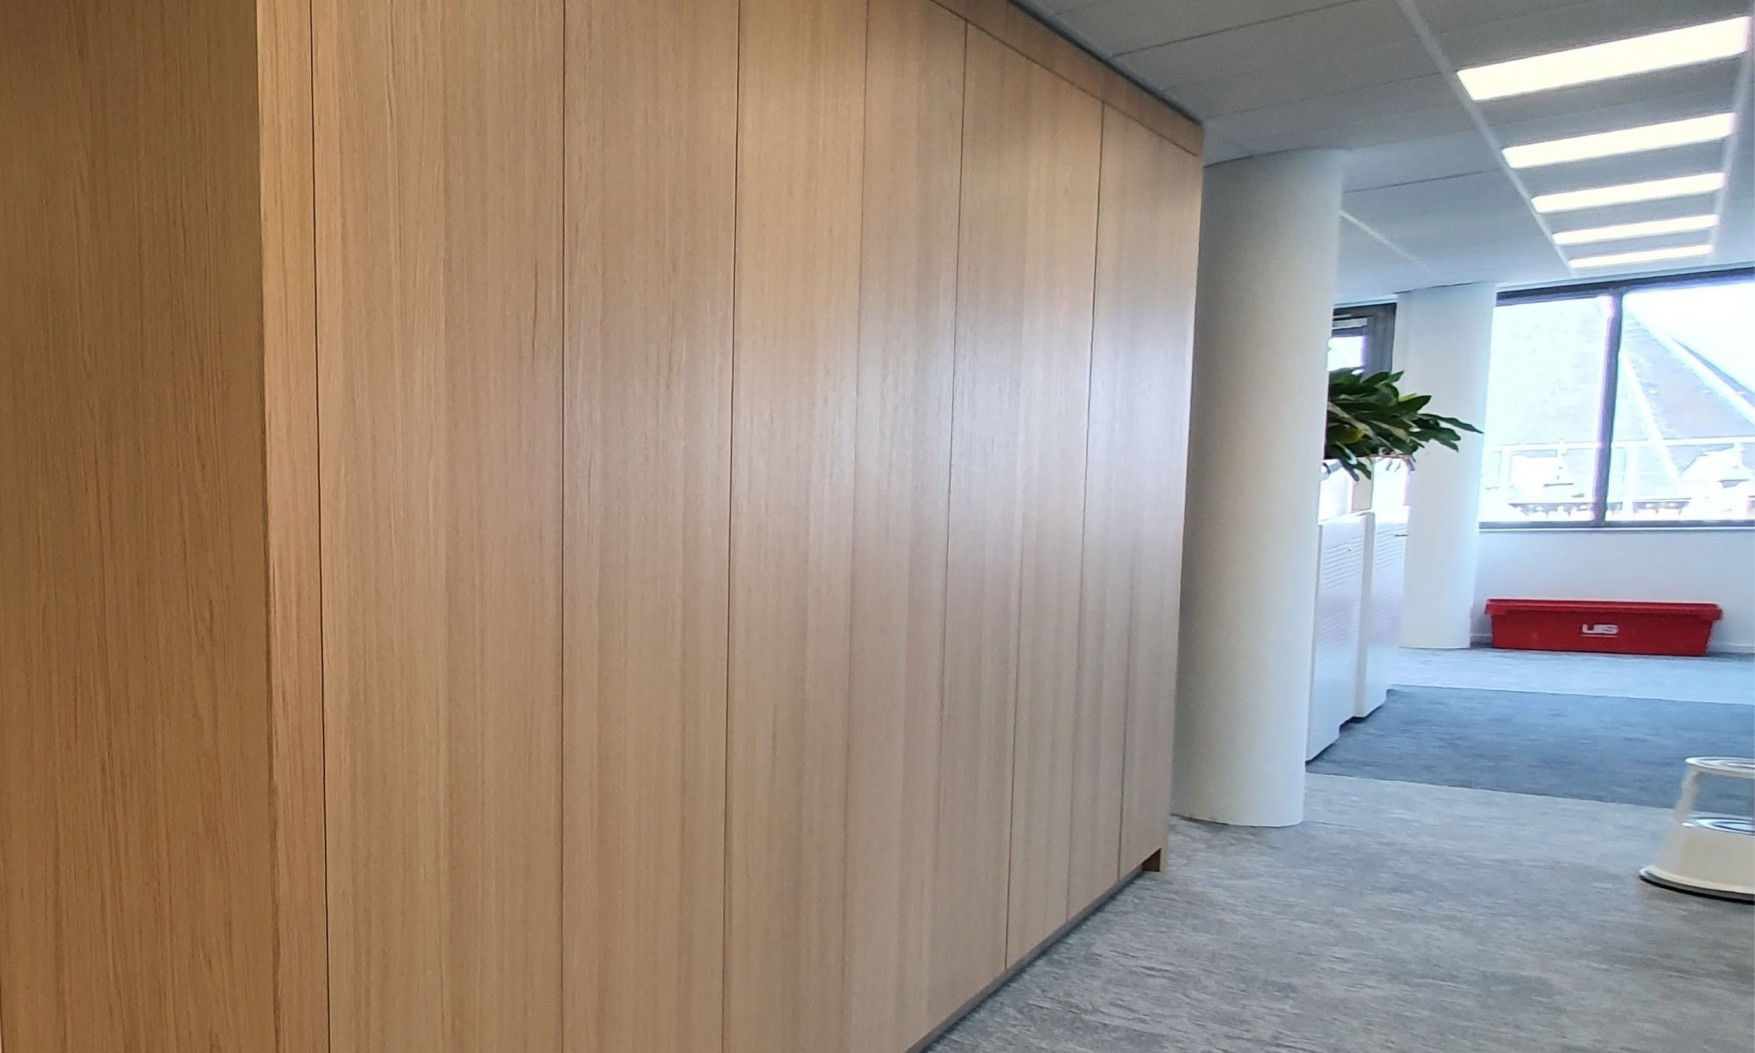 Harryvan Interieurbouw | panelen plafond en wandbekleding (OM Haarlem)